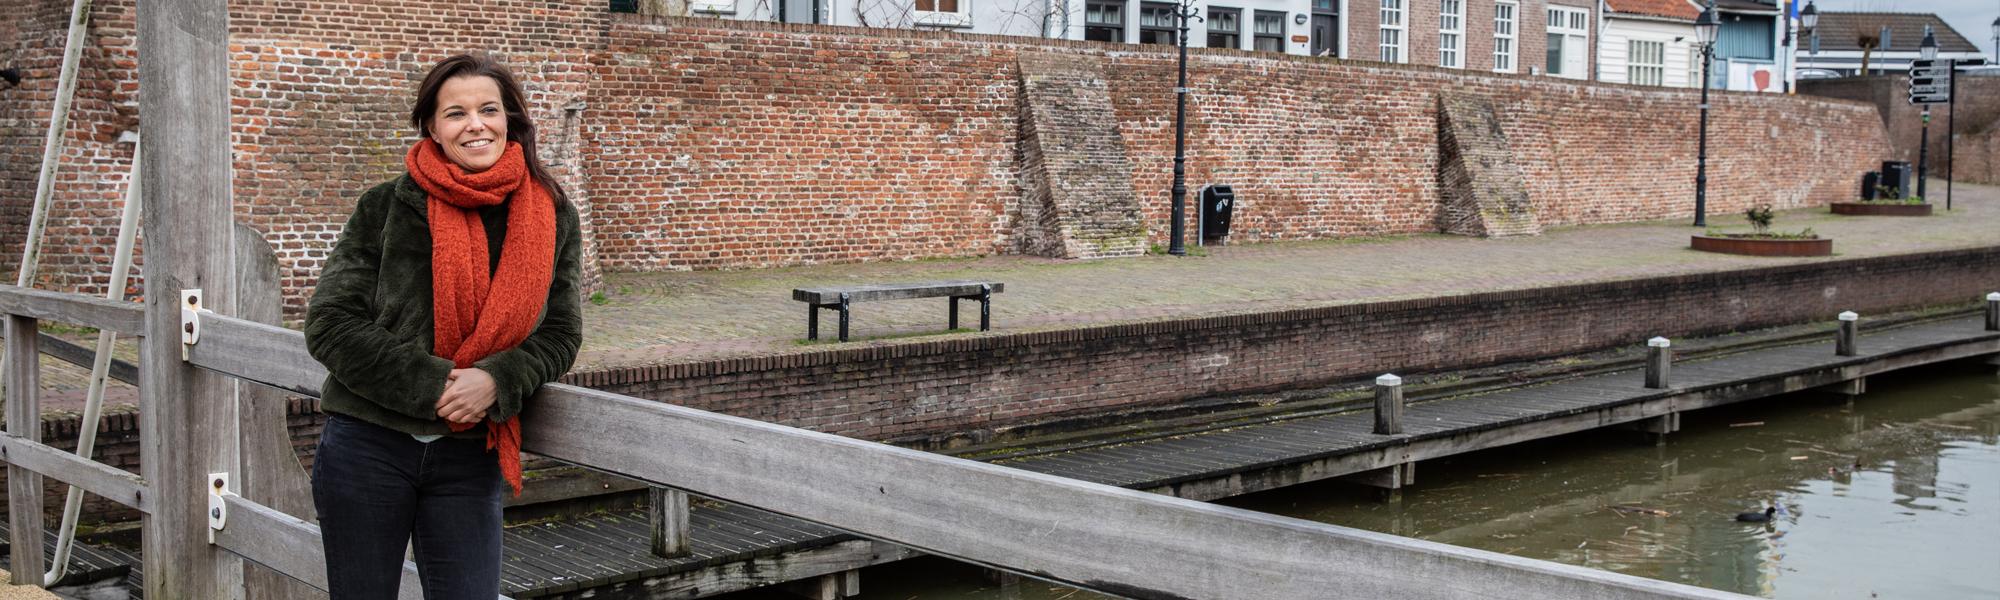 Fotograaf Utrecht portretfotograaf social media portret